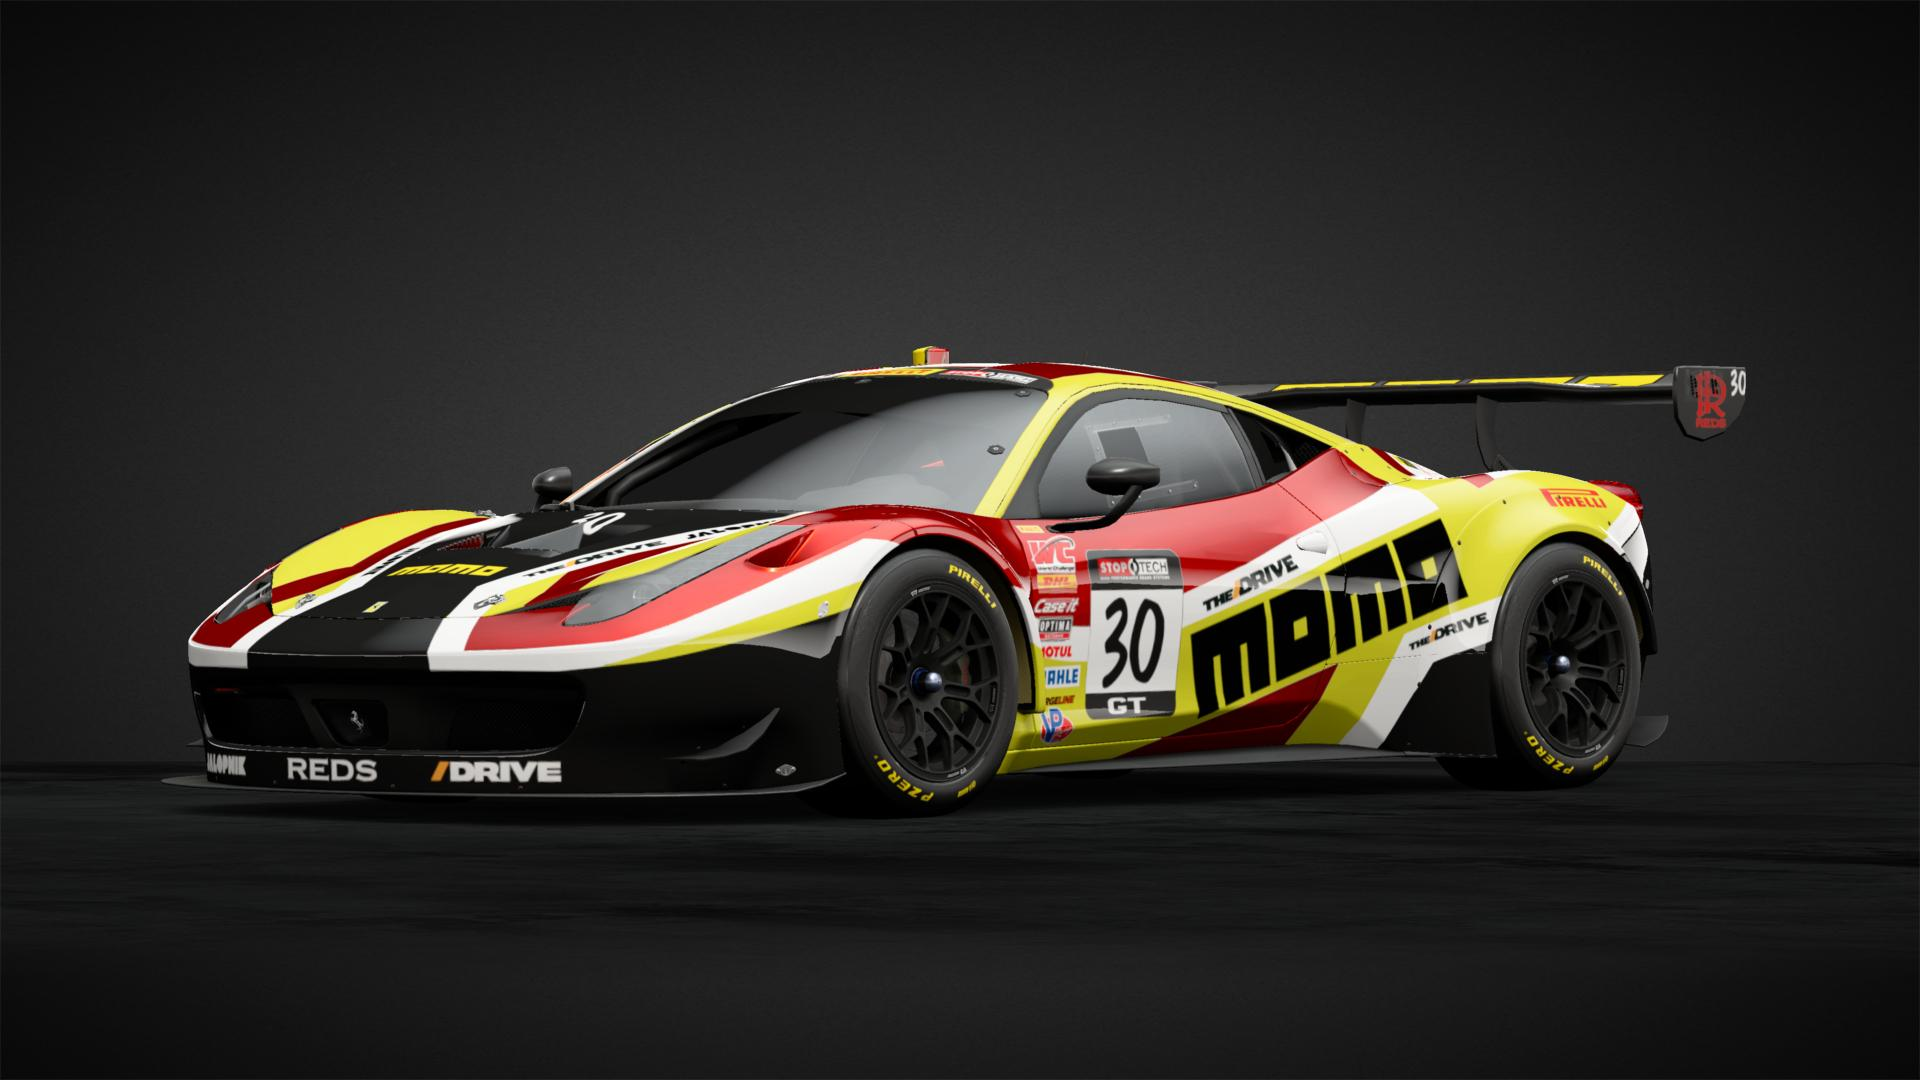 Ferrari 458 GT3 Momo (#font rdx) - Car Livery by